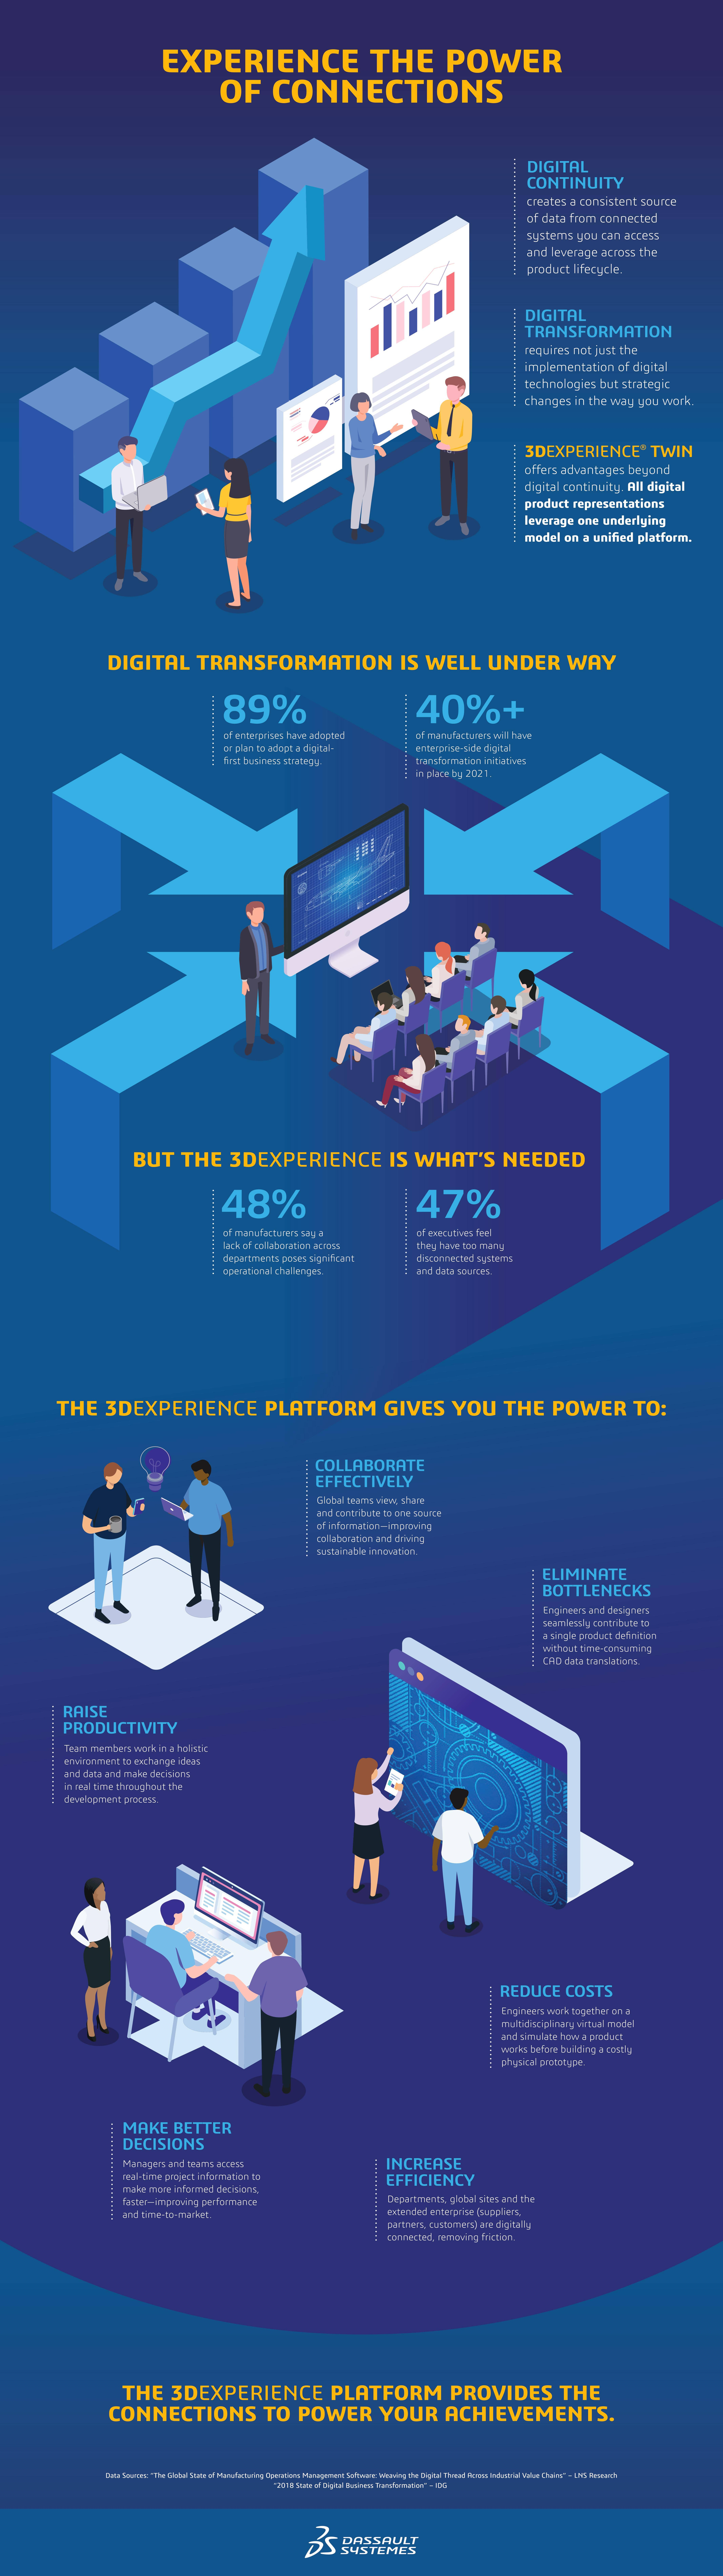 The 3DEXPERIENCE® platform goes beyond digital continuity> desktop infography> Dassault Systèmes®